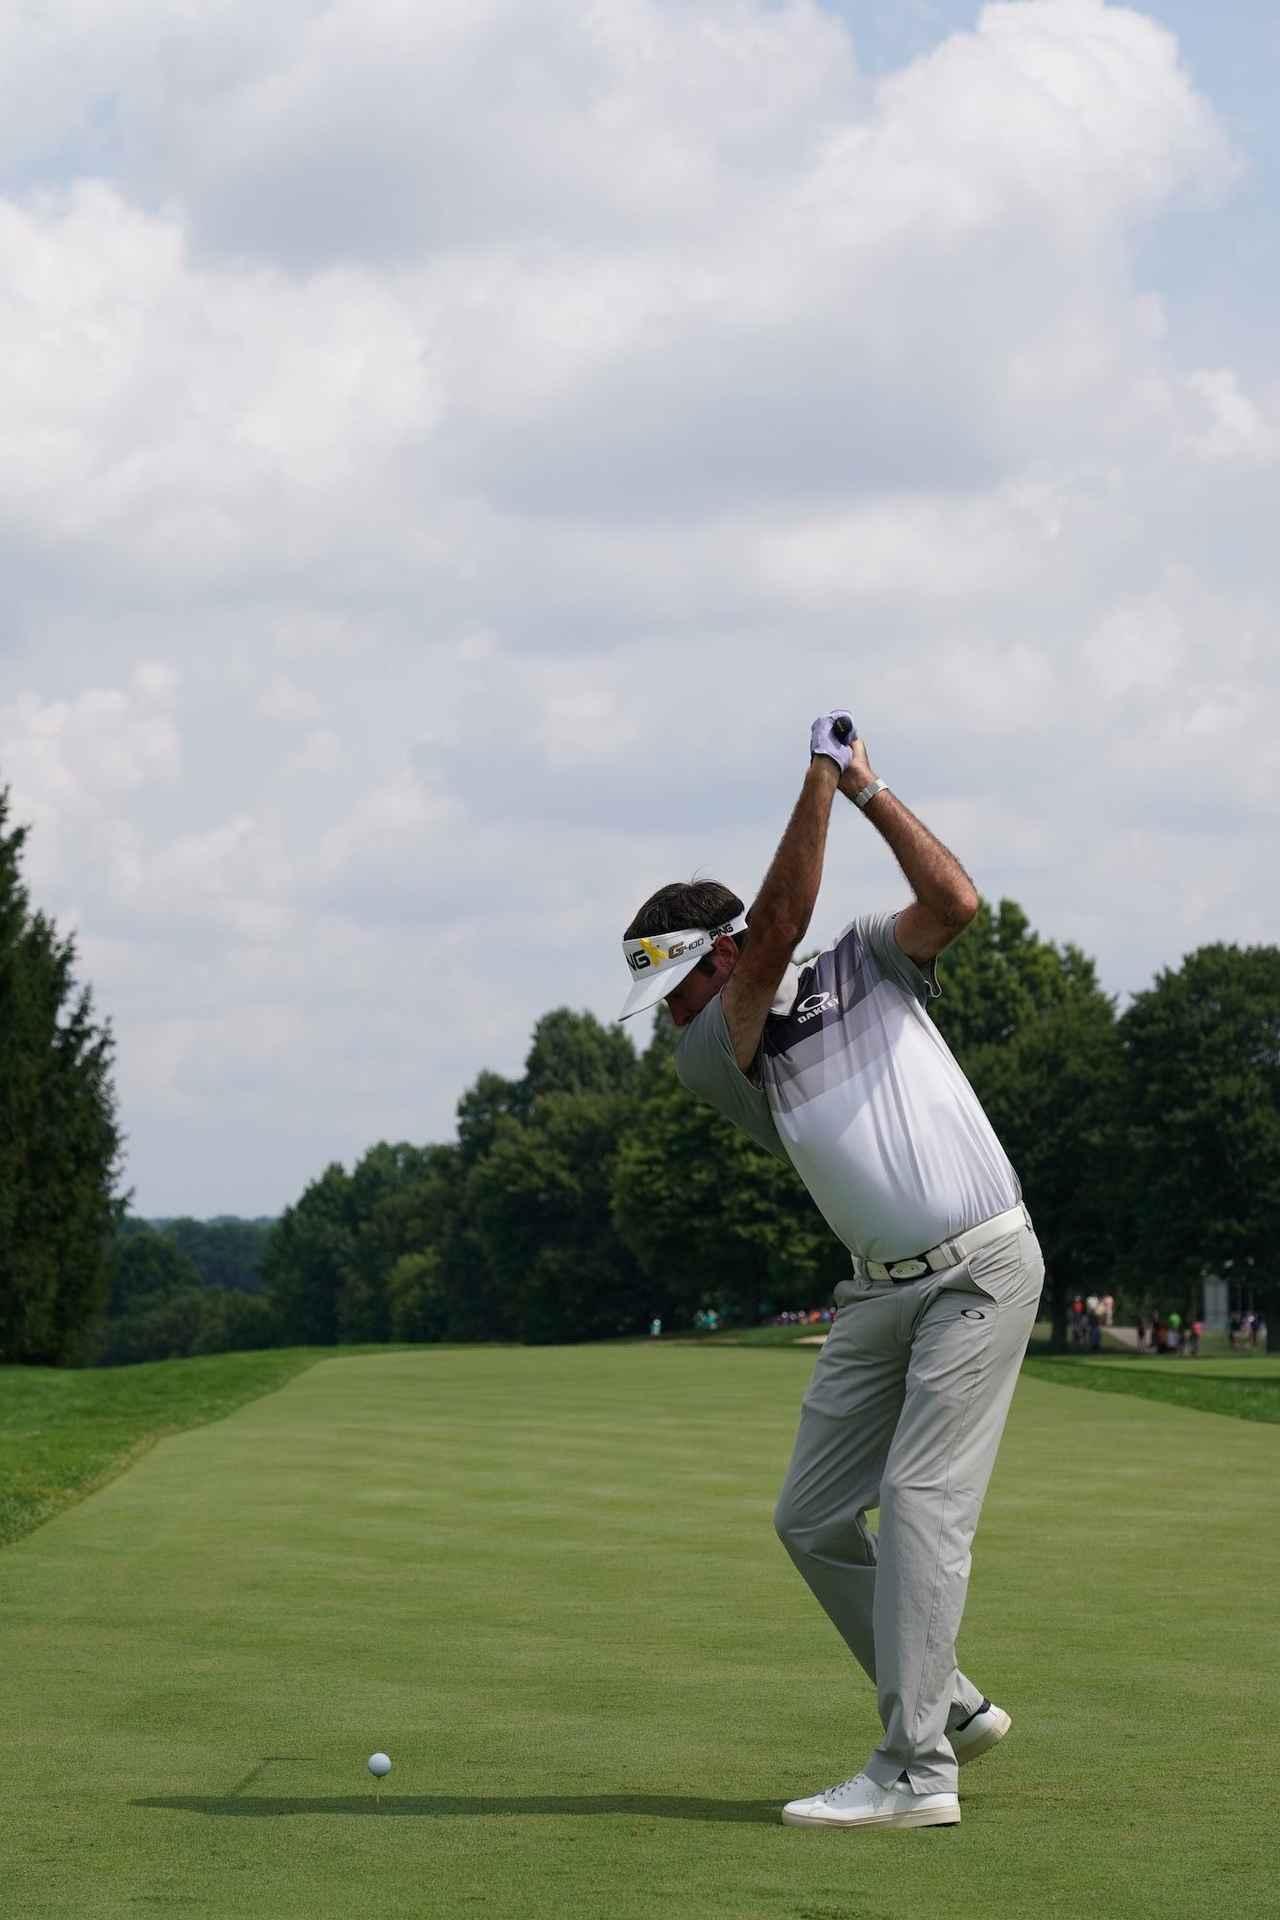 Images : 9番目の画像 - 強烈! バッバ・ワトソンのドライバーショット - みんなのゴルフダイジェスト